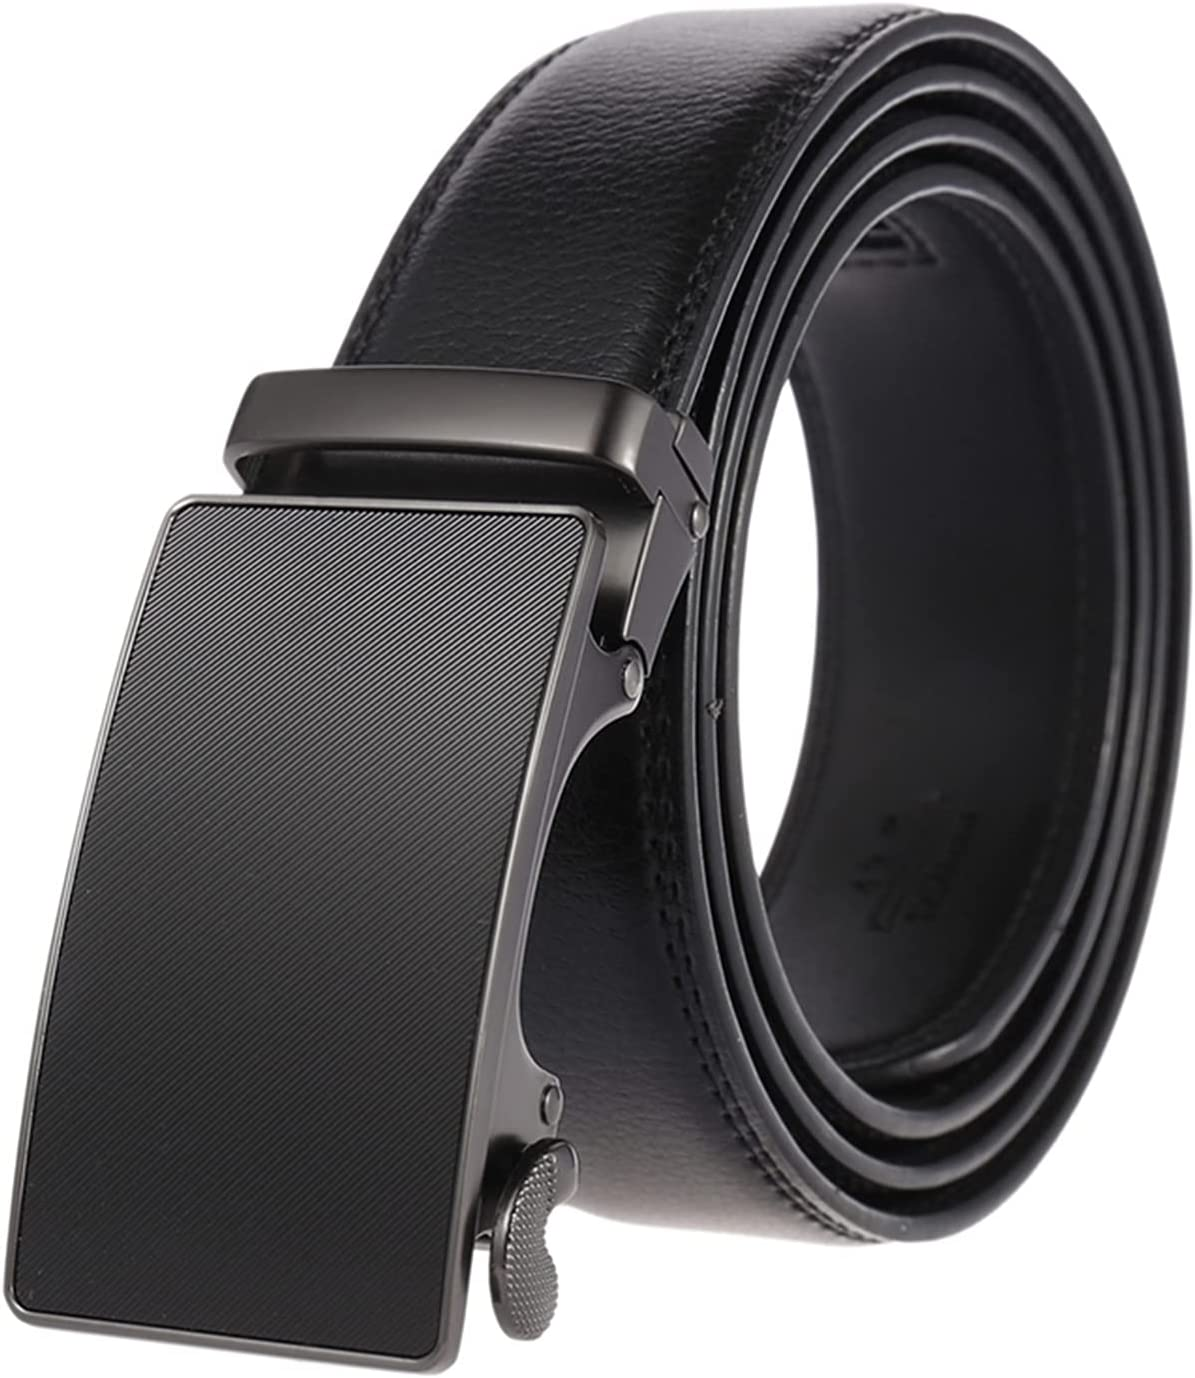 Max 74% OFF Men's Belt 2021 Man Adjustab Max 41% OFF Leather Buckle Automatic